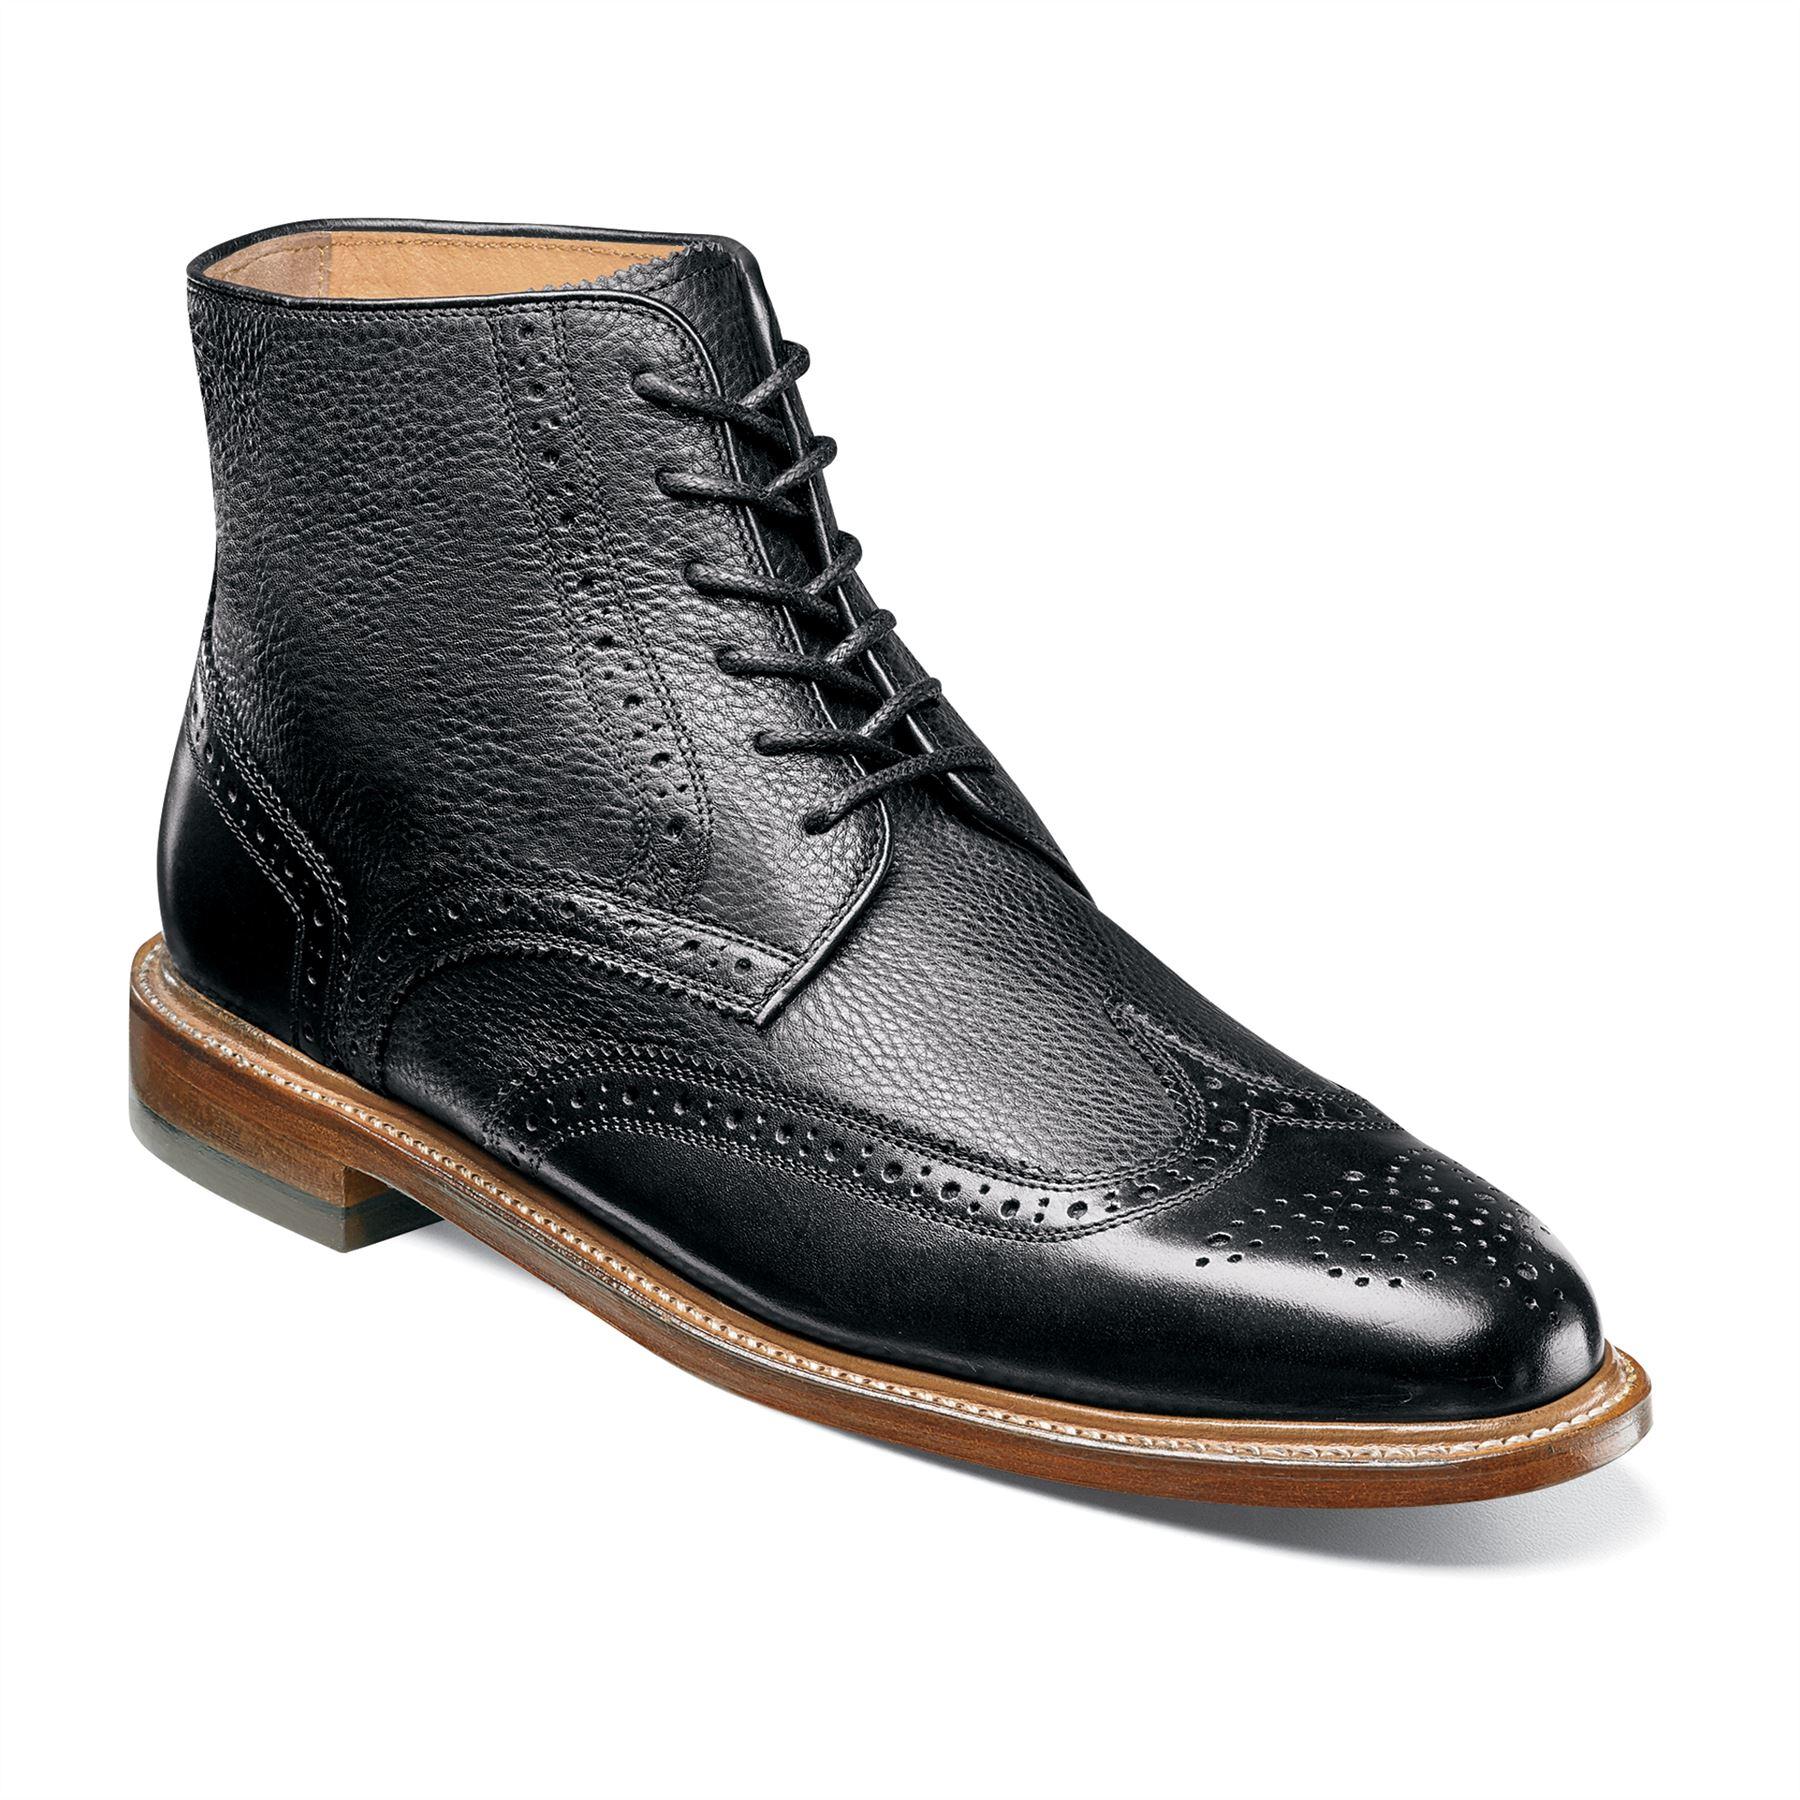 The Florsheim Shoes High Top